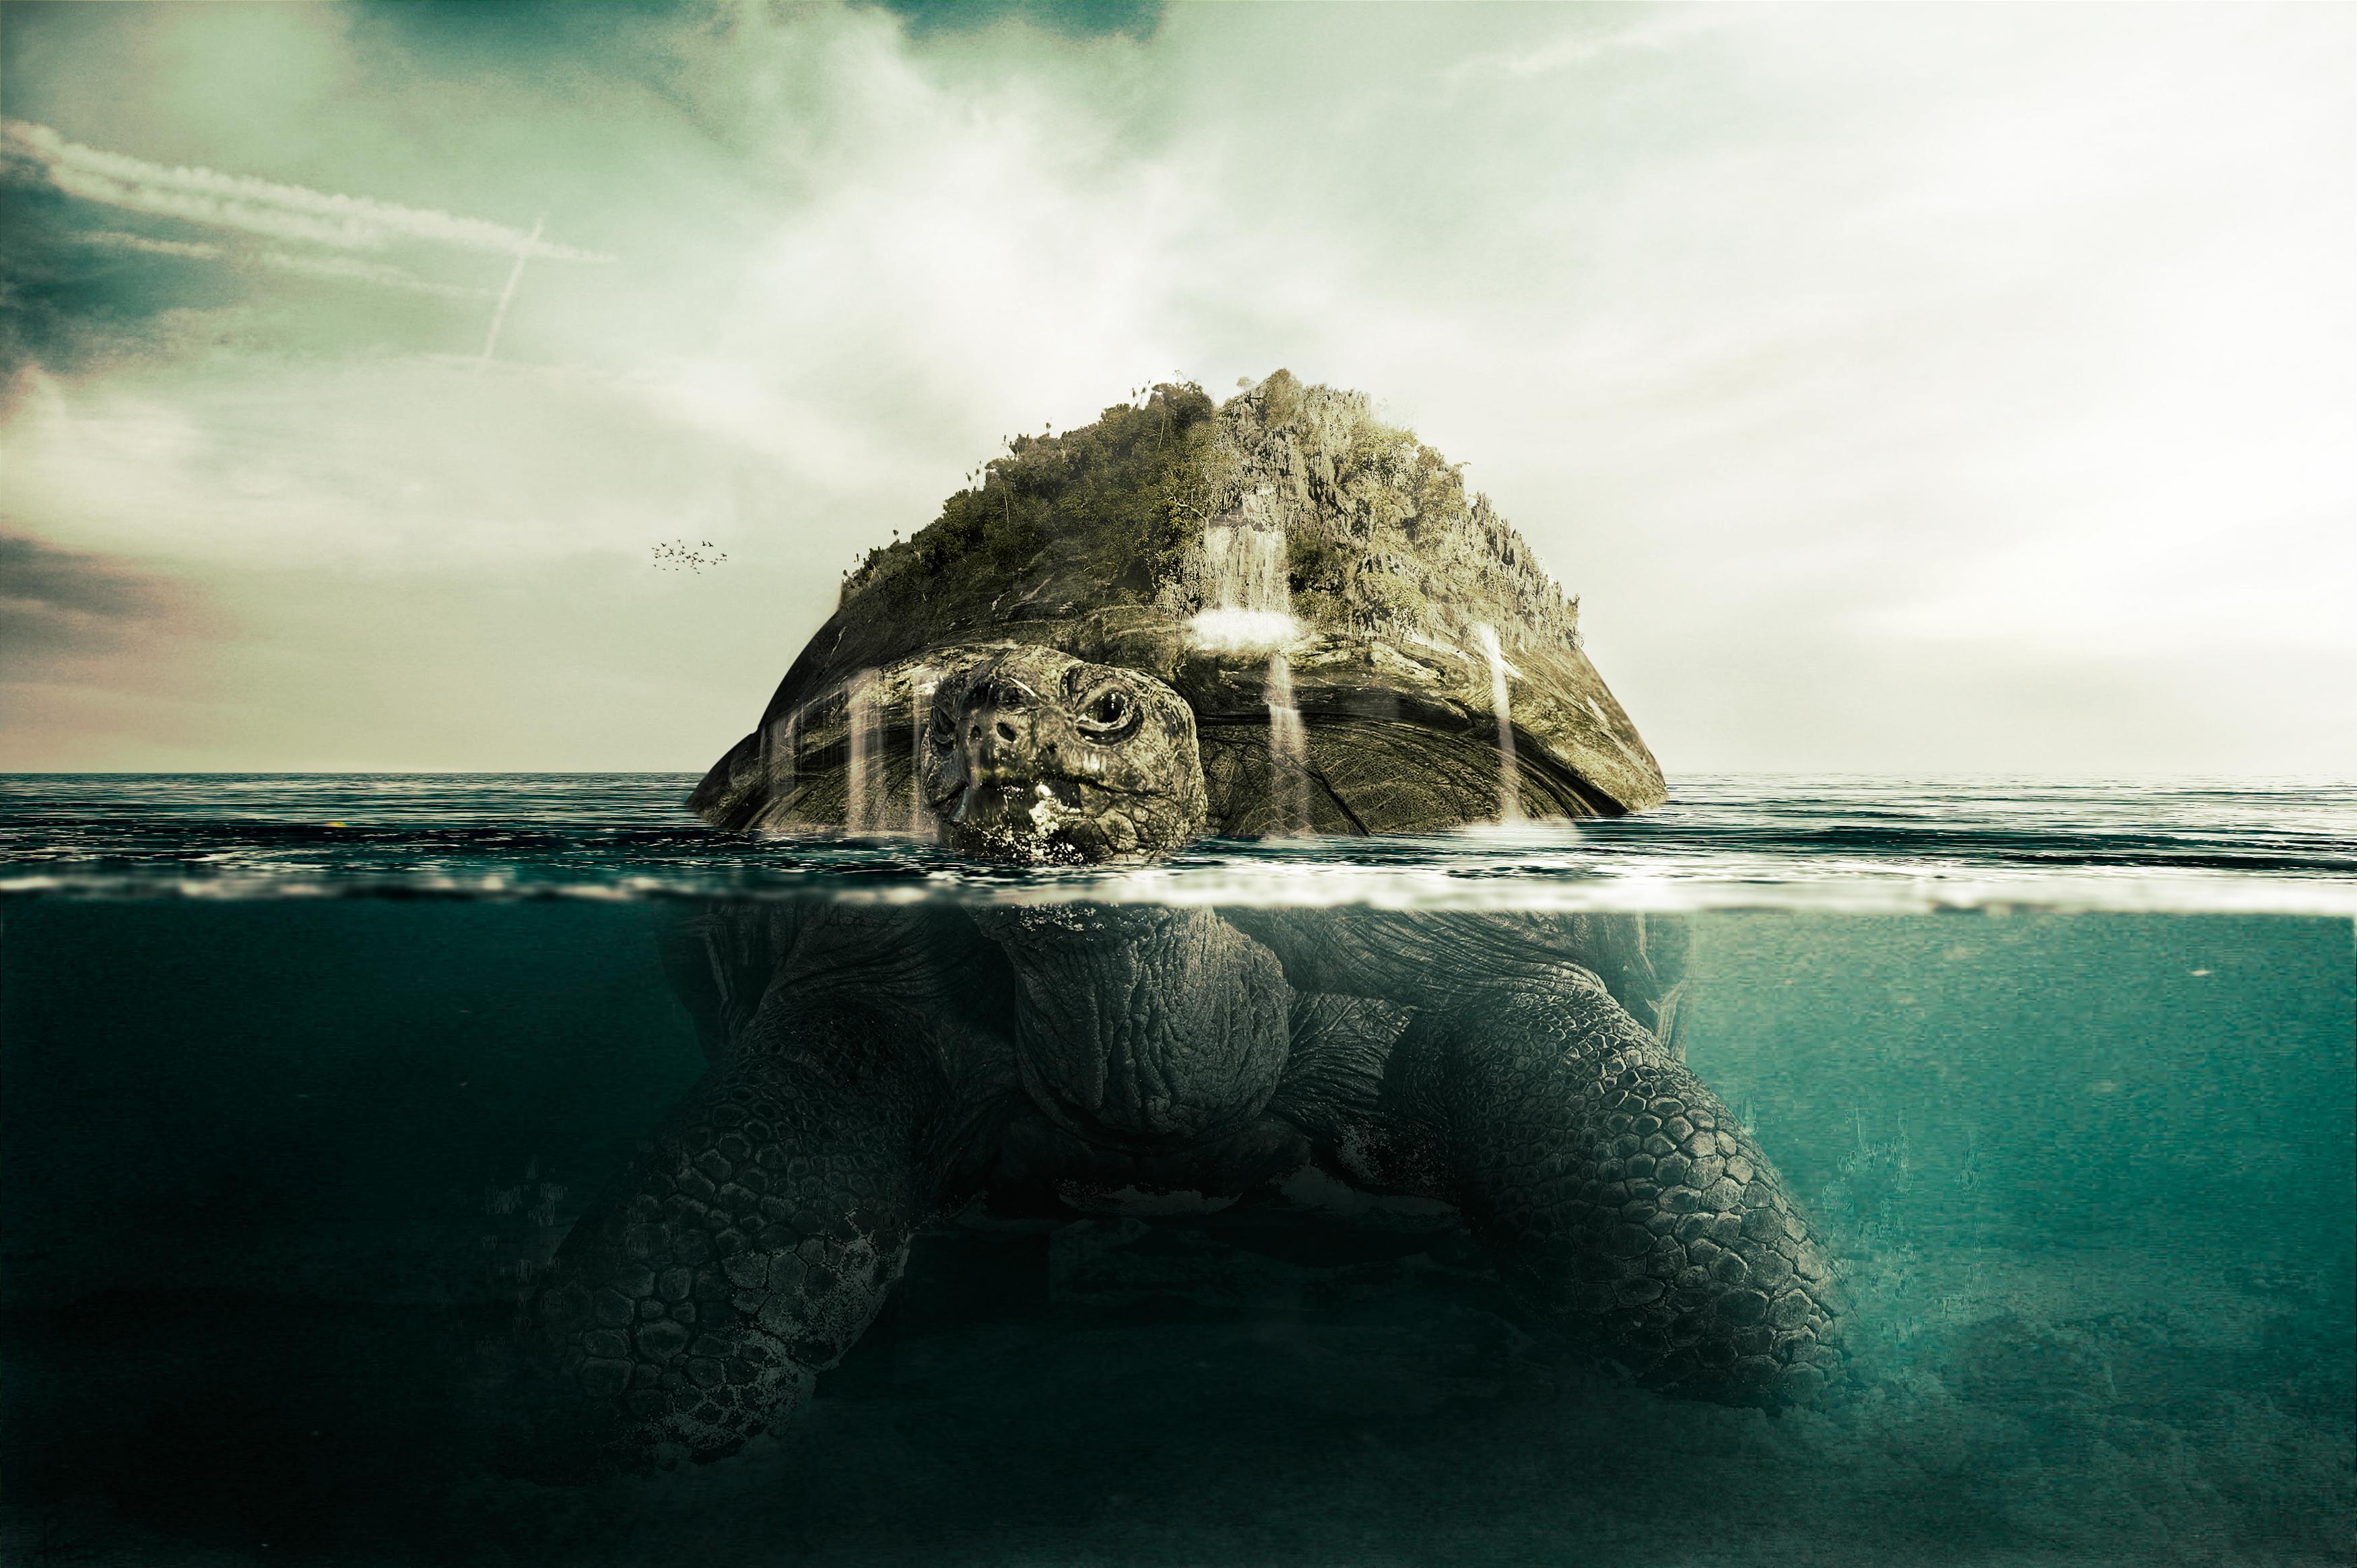 Giant Turtle + tut